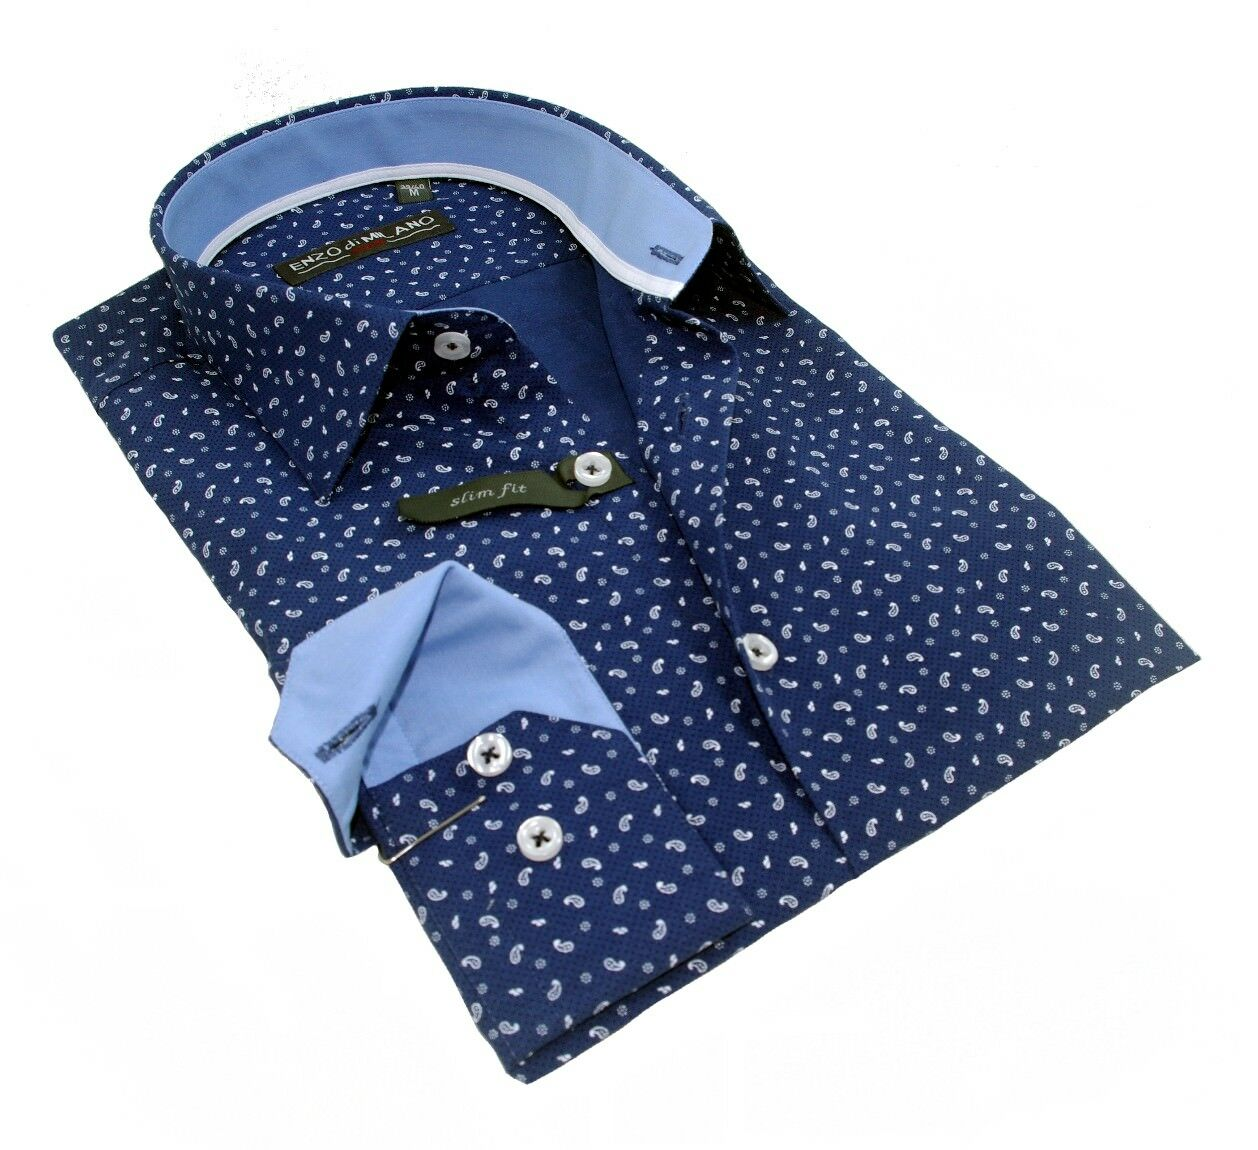 Chemise Homme bleu marine à Italienne motif cintrée Italienne à Enzo Di Milano SlimFit T.L aa01f2